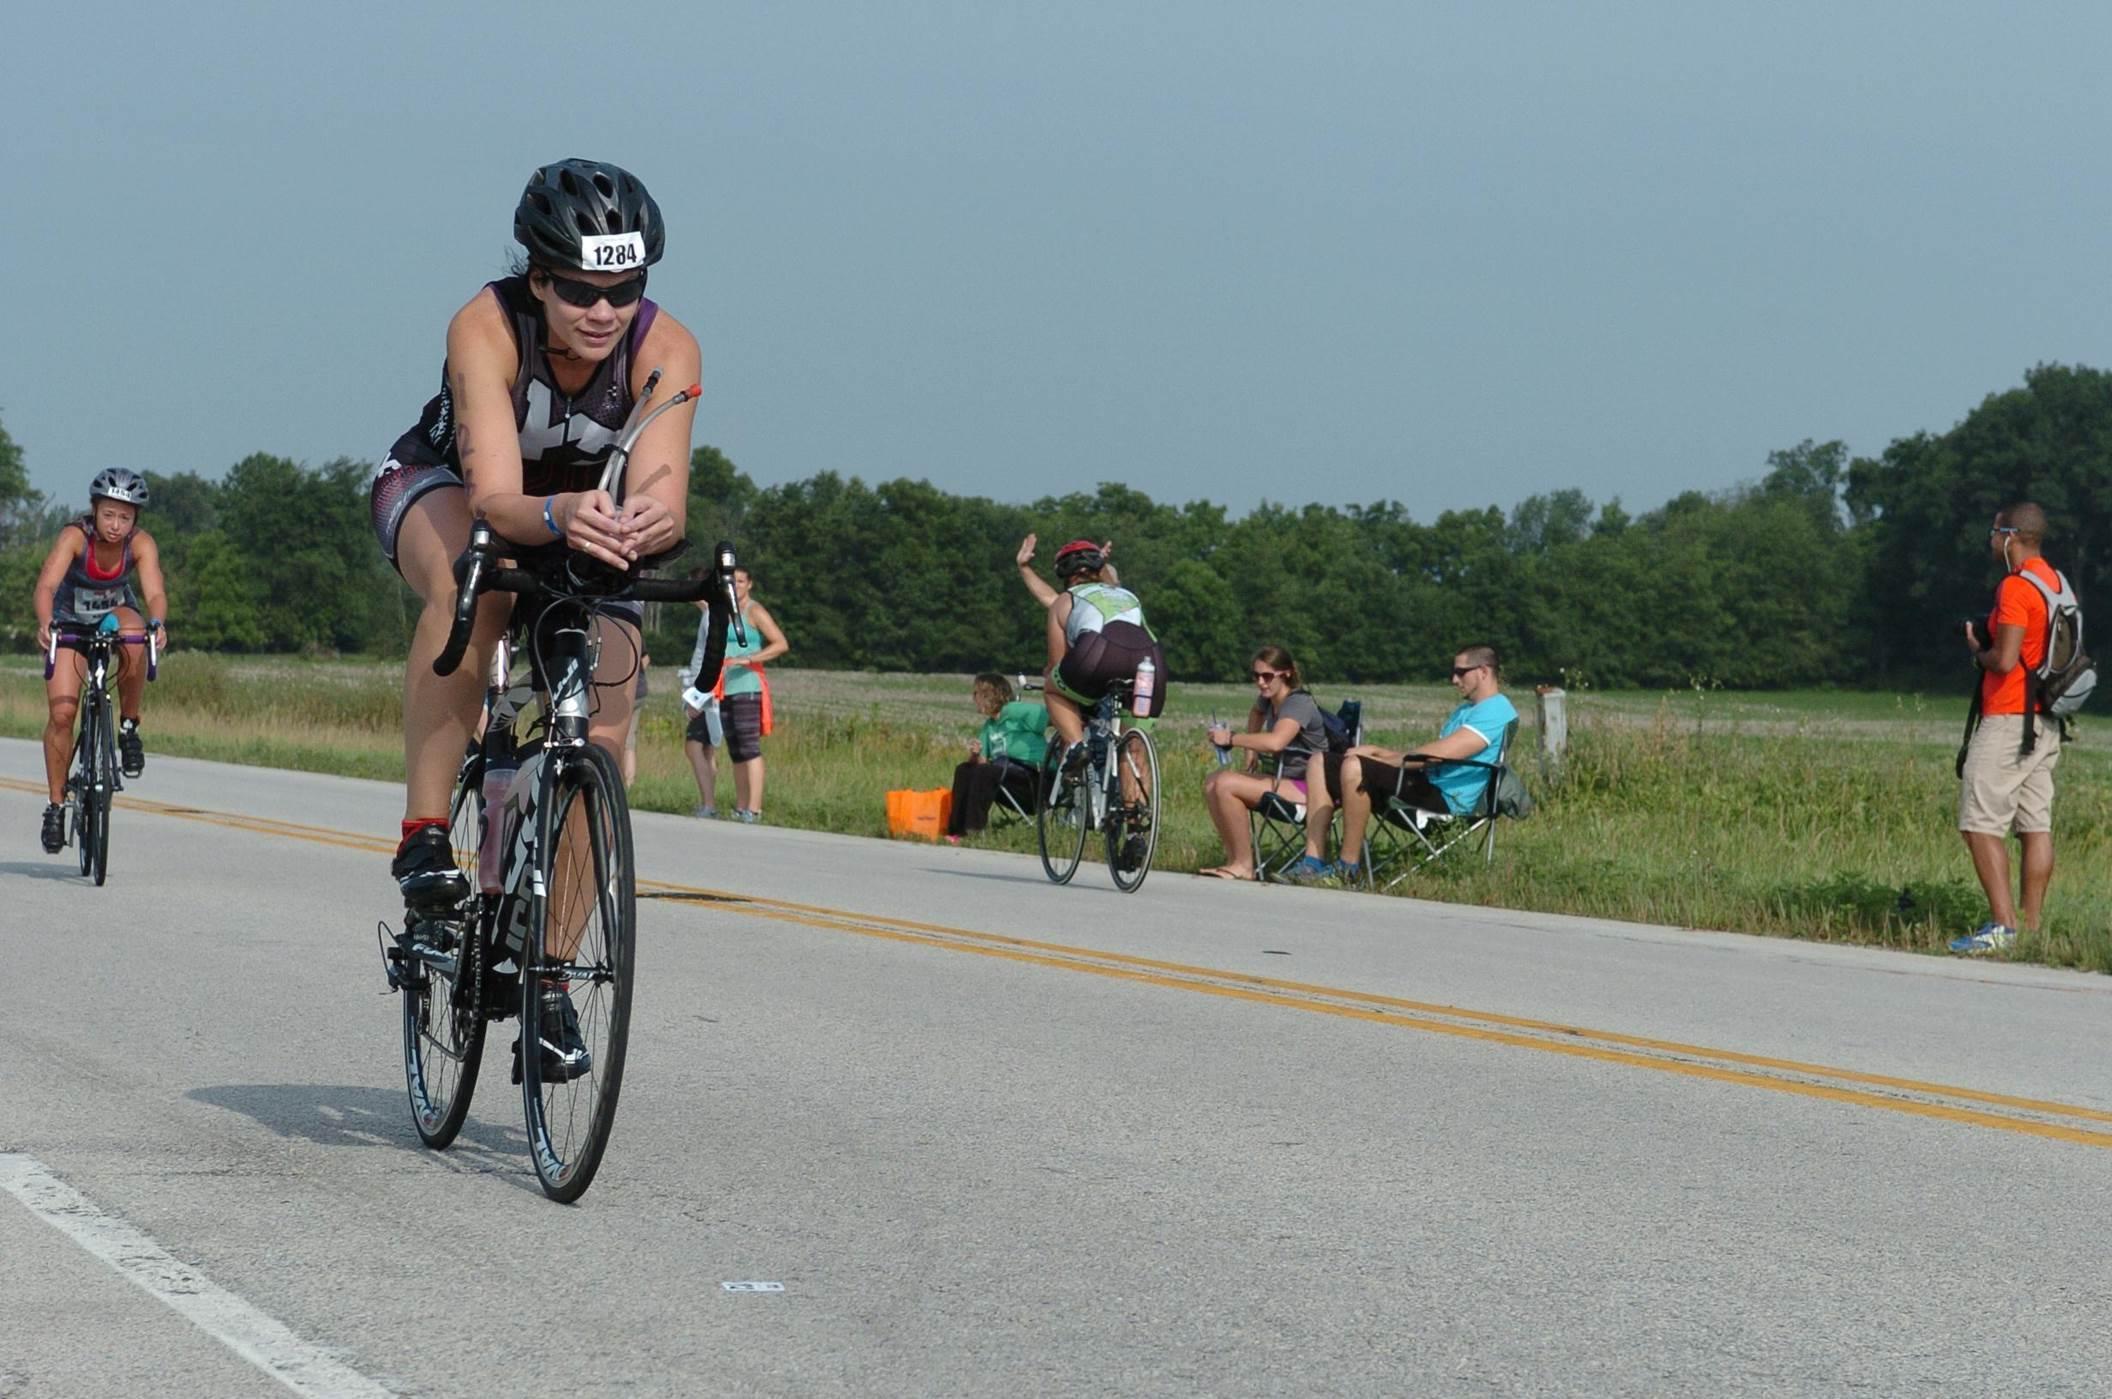 On the Muncie Half Ironman Bike course, July 11, 2015